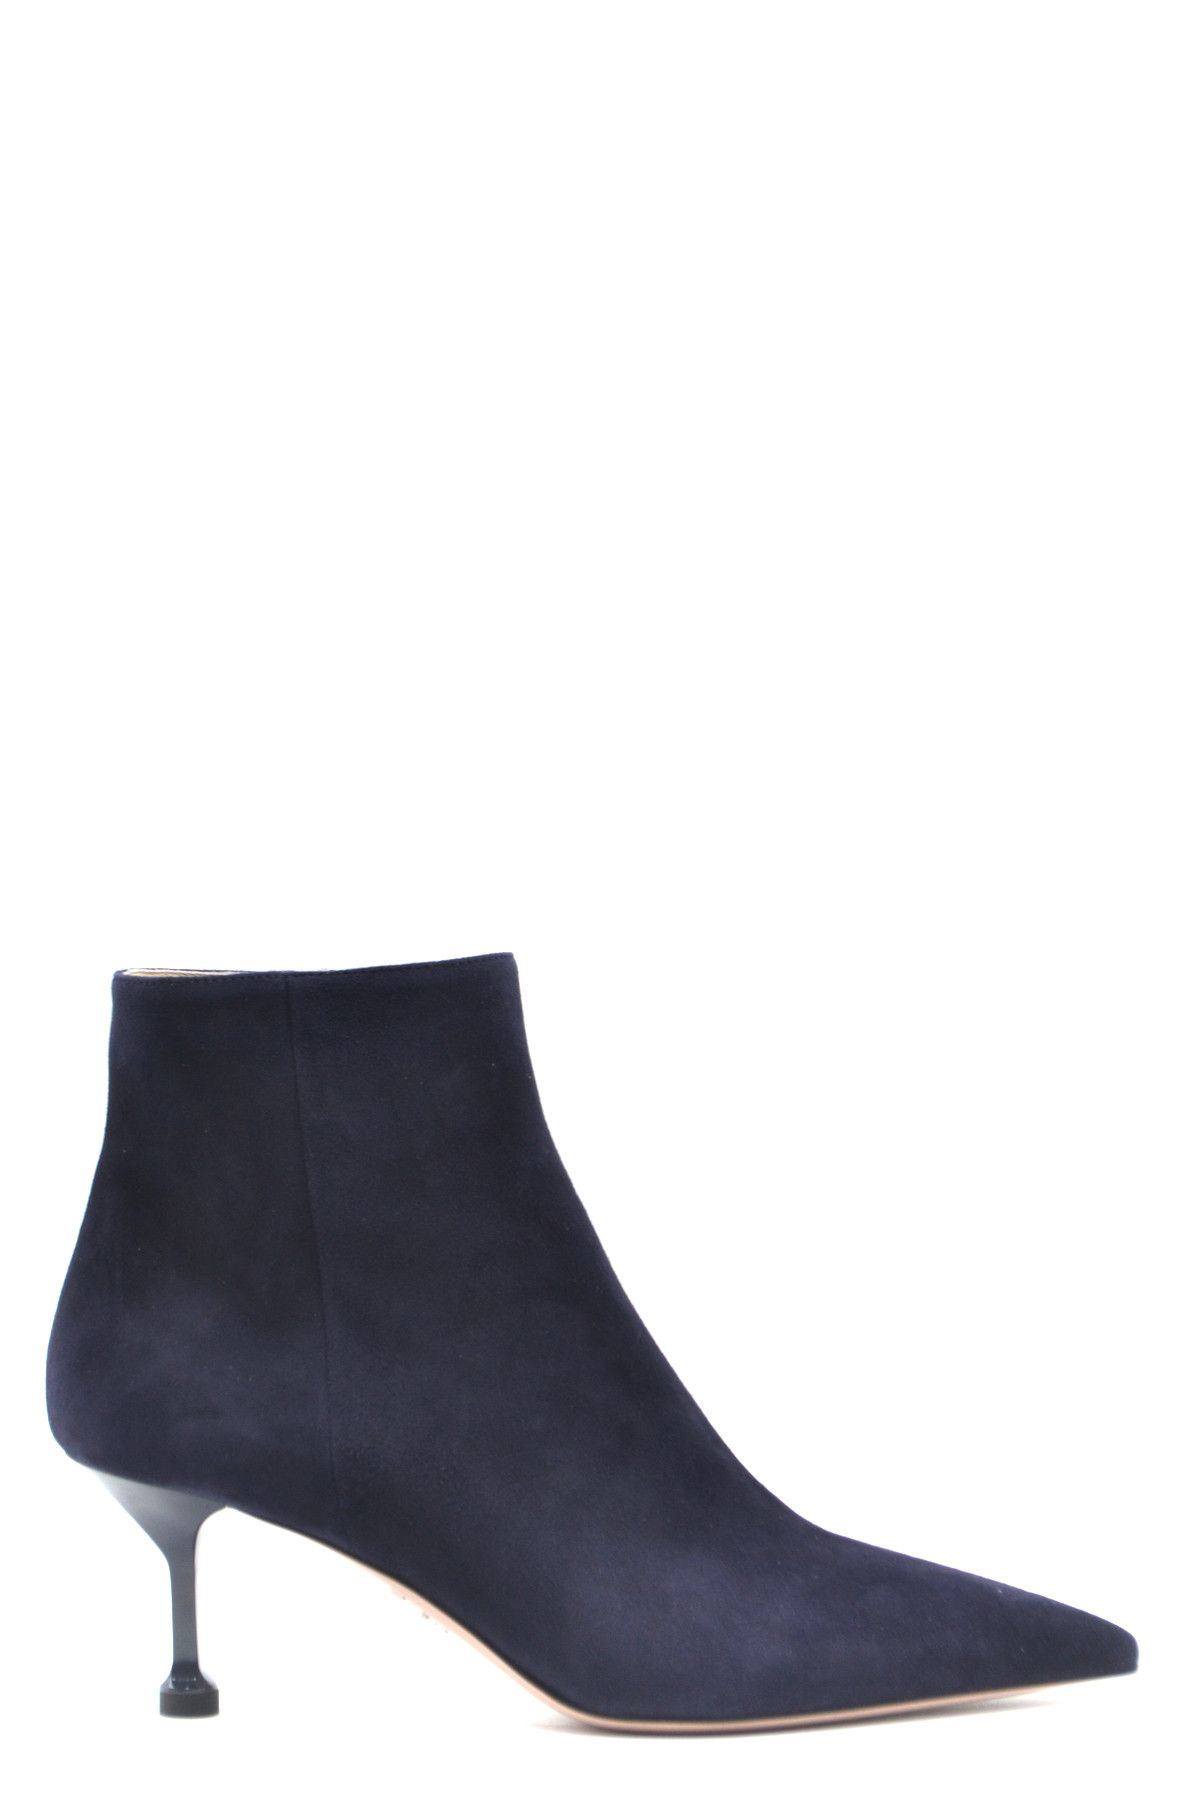 Prada Women's Boots In Blue